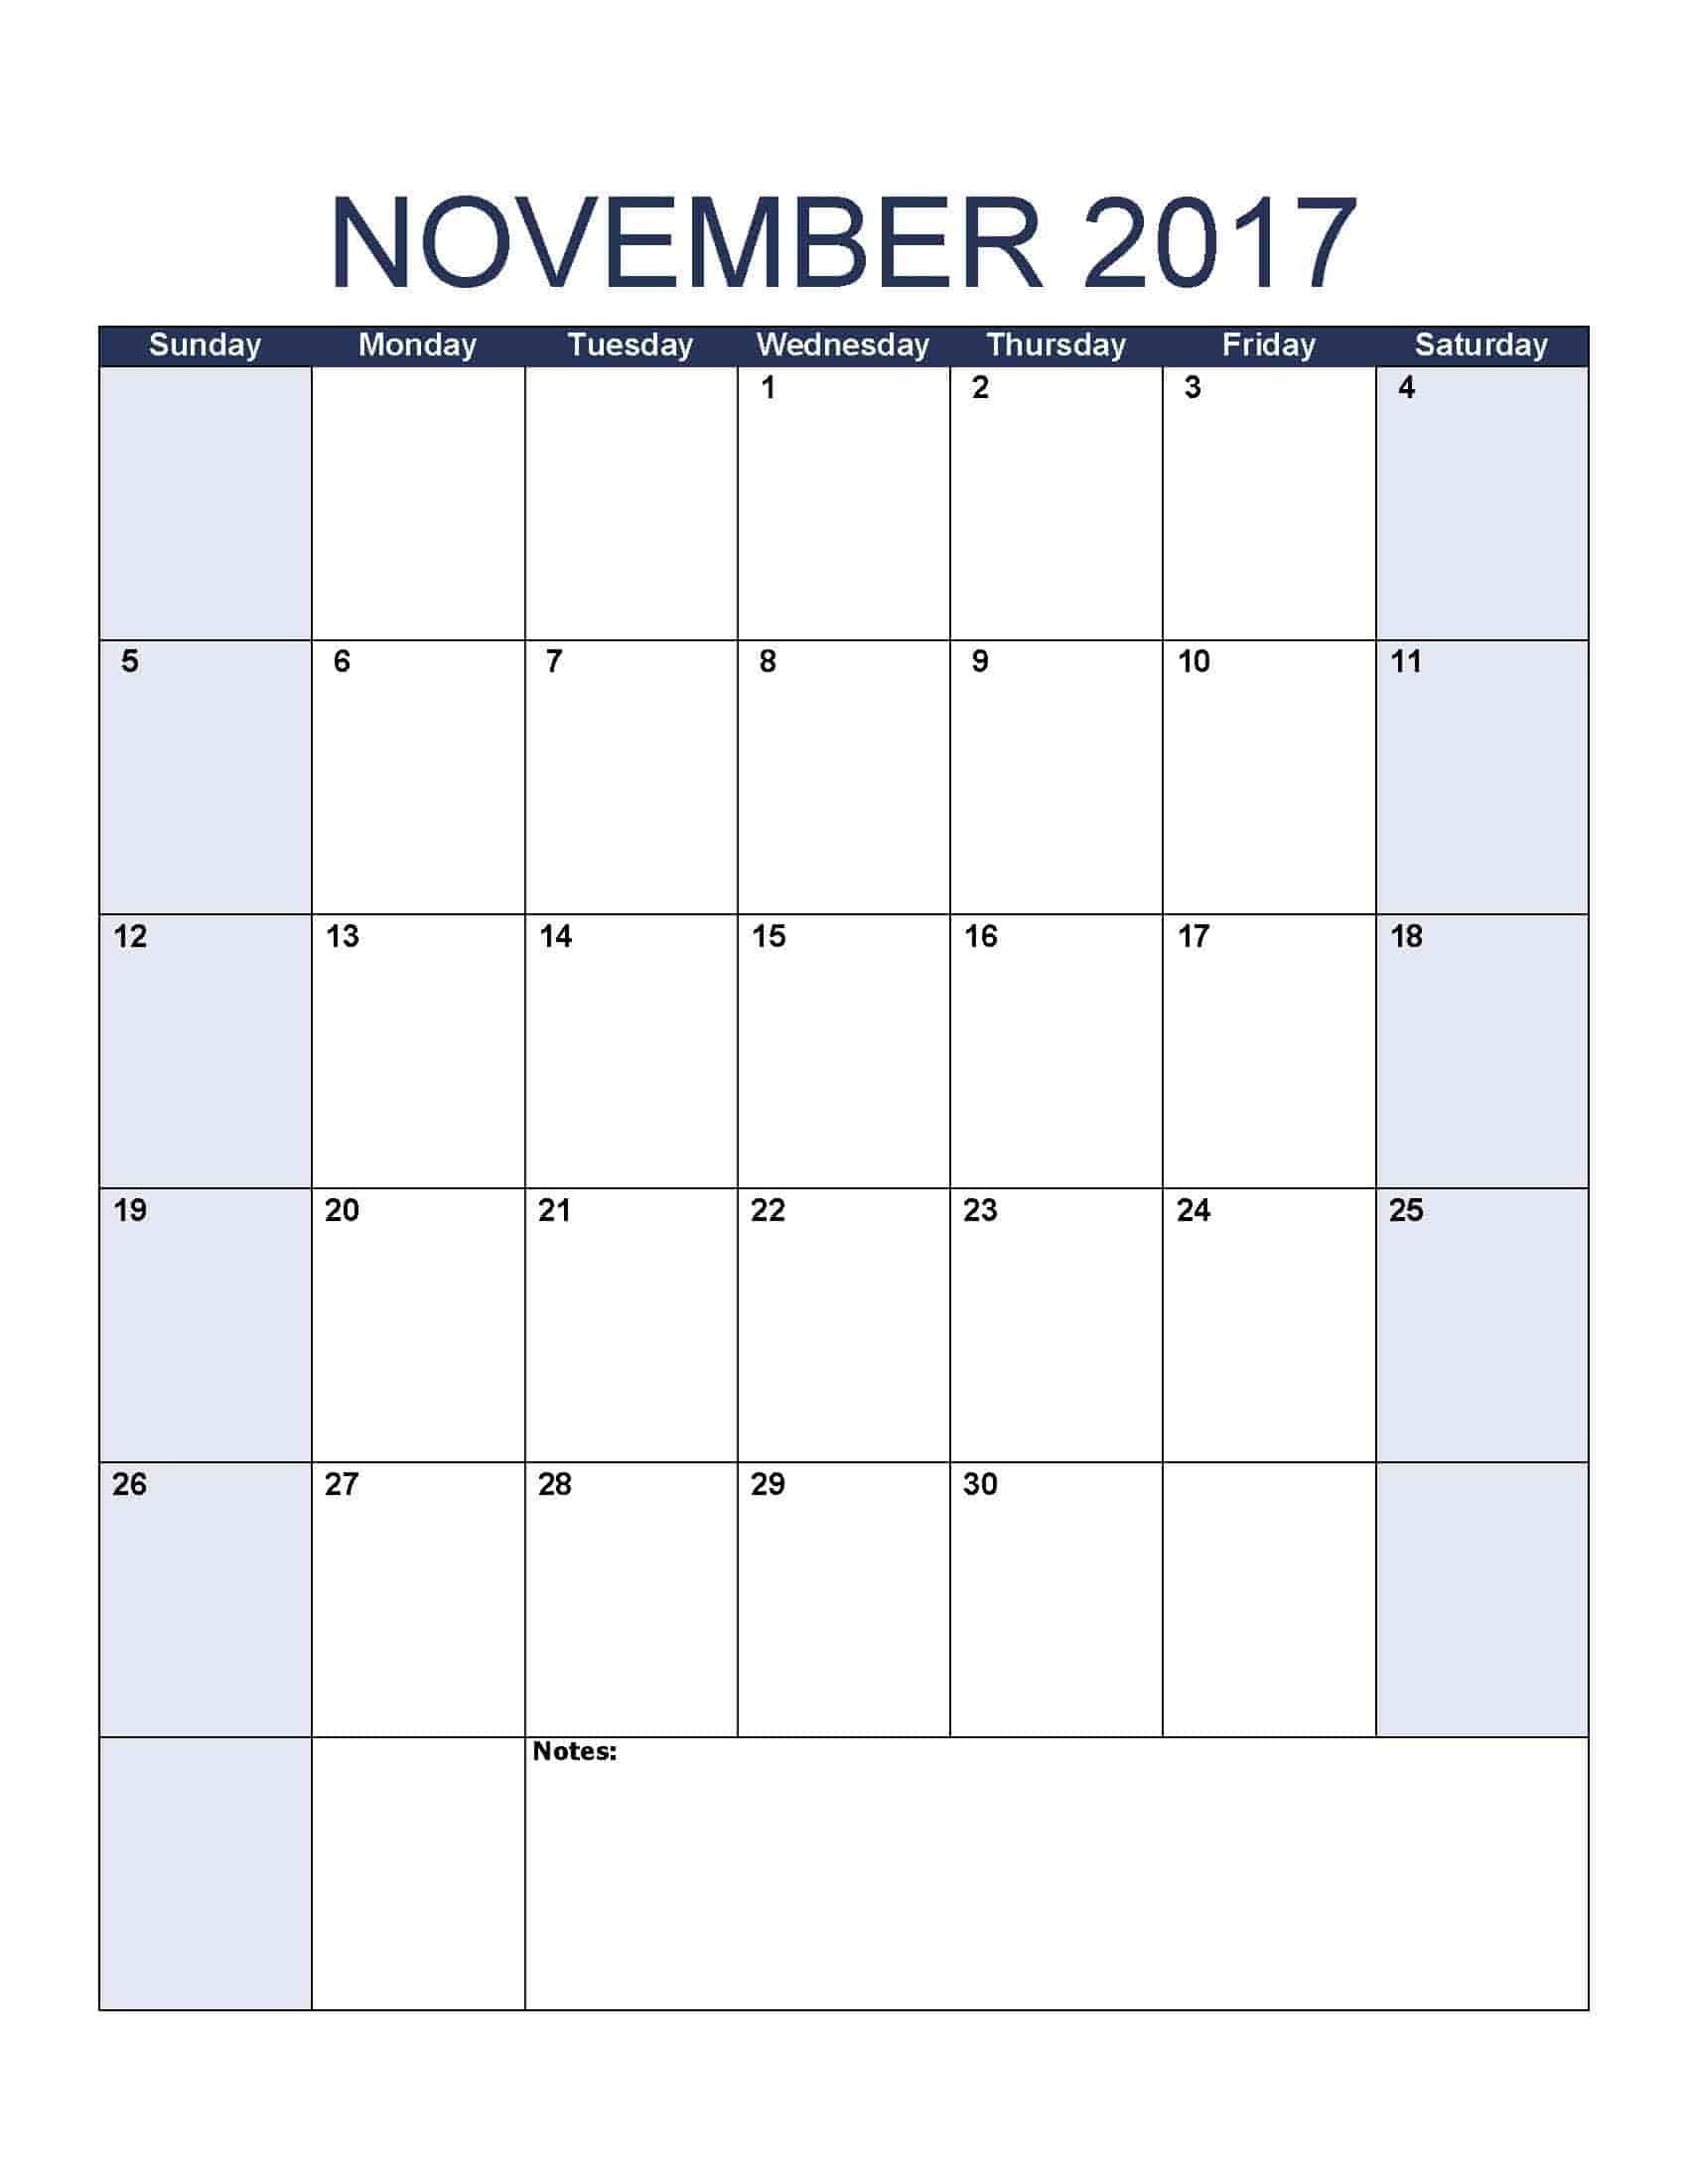 2017 Calendar - Free, Printable Calendar Templates-8.5 By 11 Blank Calendar Month